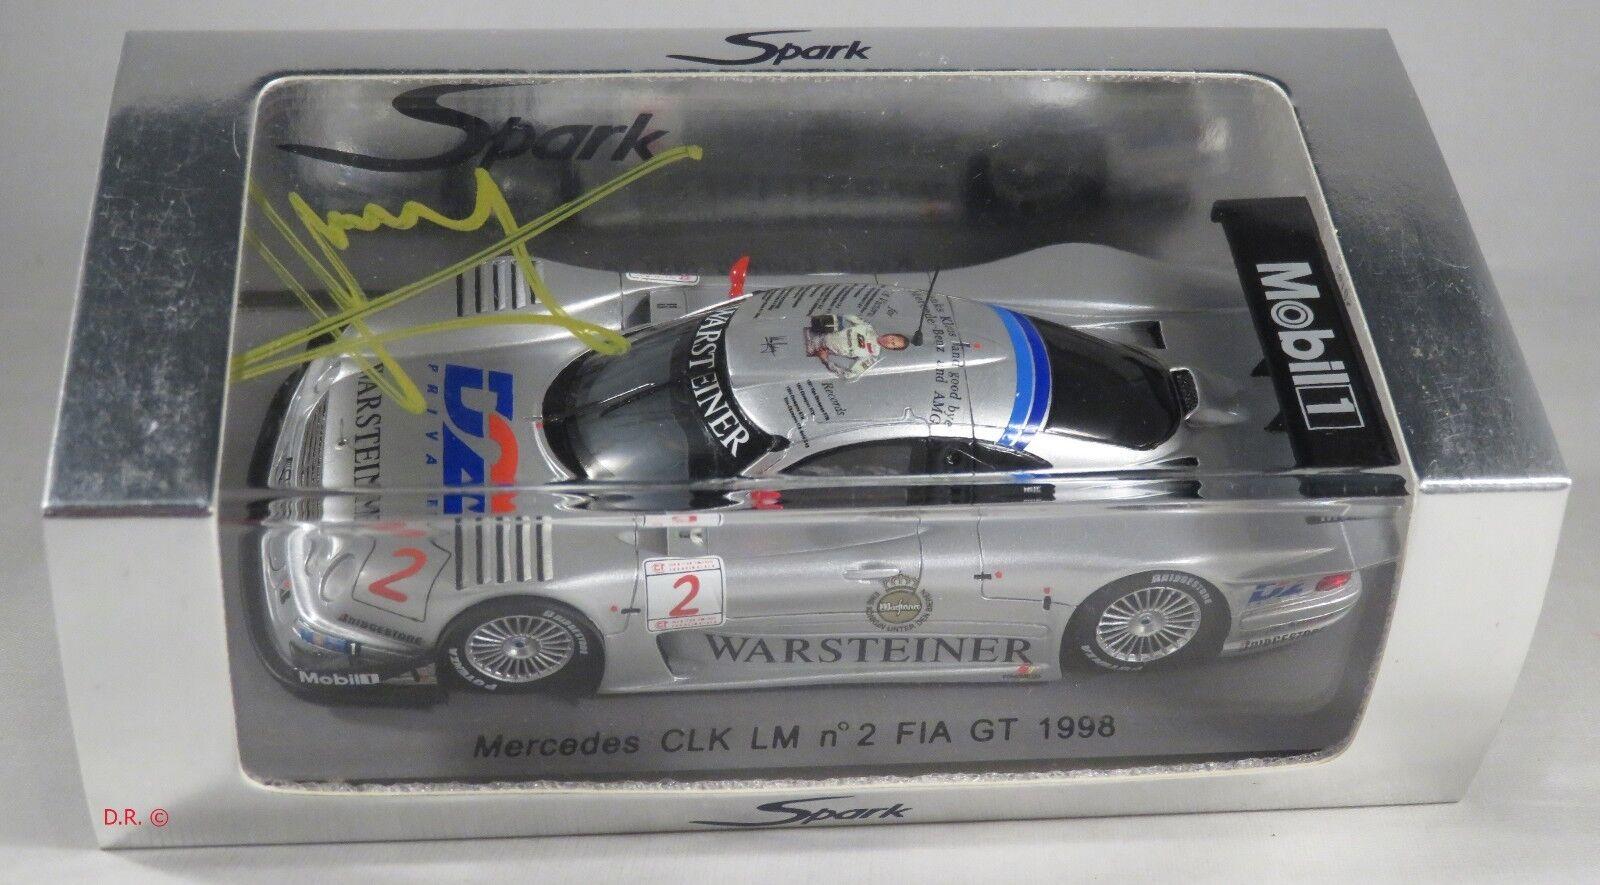 Mercedes CLK LM LAGUNA SECA FIA GT 1998 K. Ludwig Last Race Signed spark 1 43